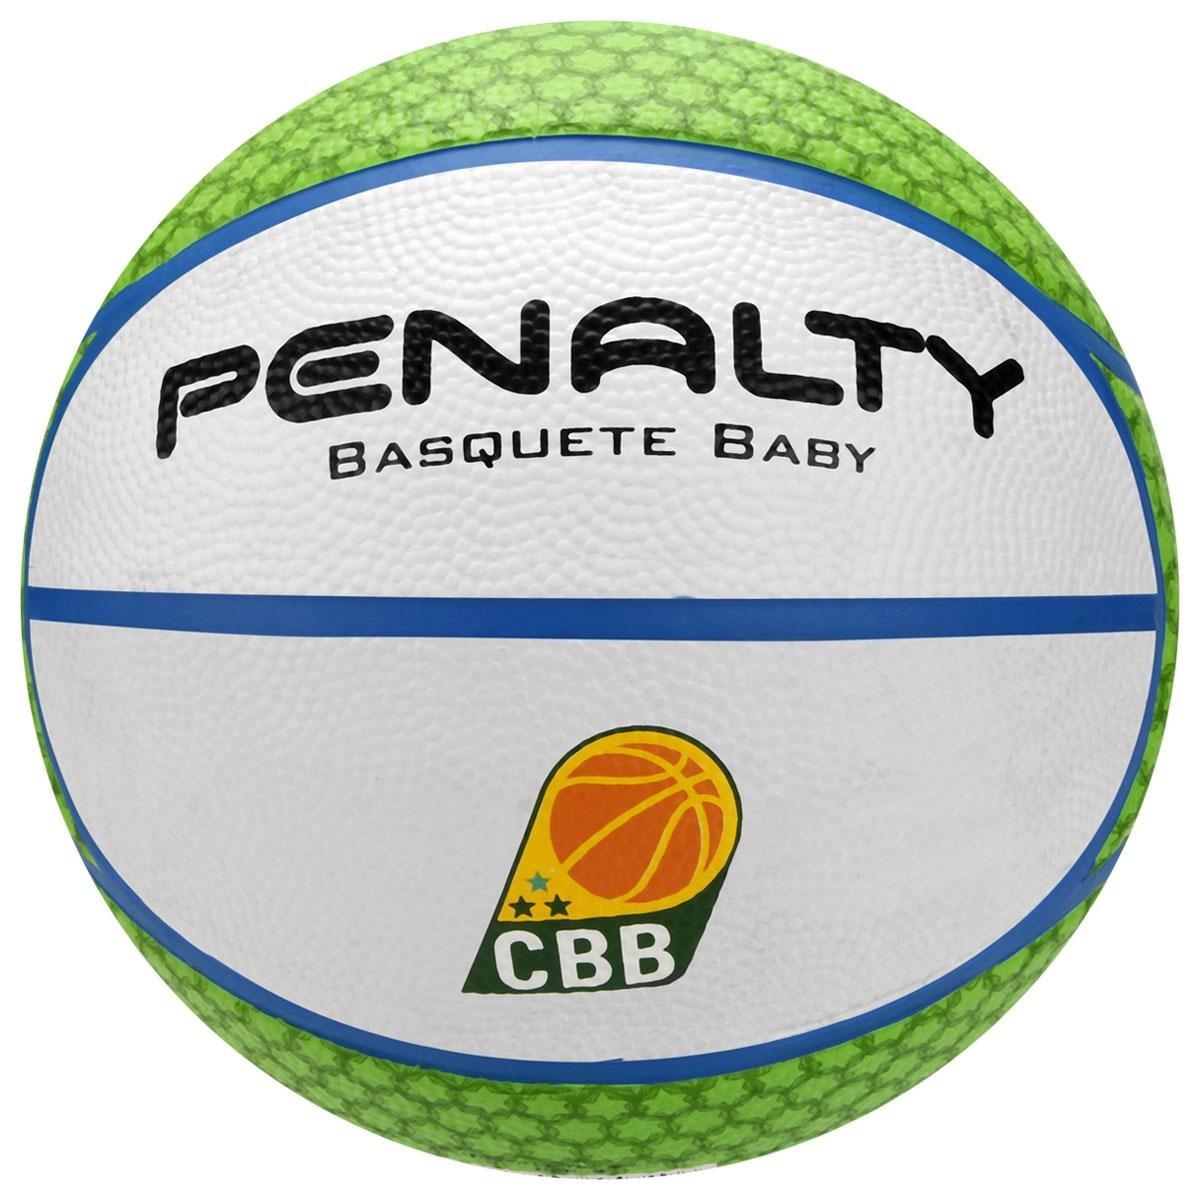 Bola Penalty Shoot 4 Infantil - Compre Agora  3a073e5f2ef39